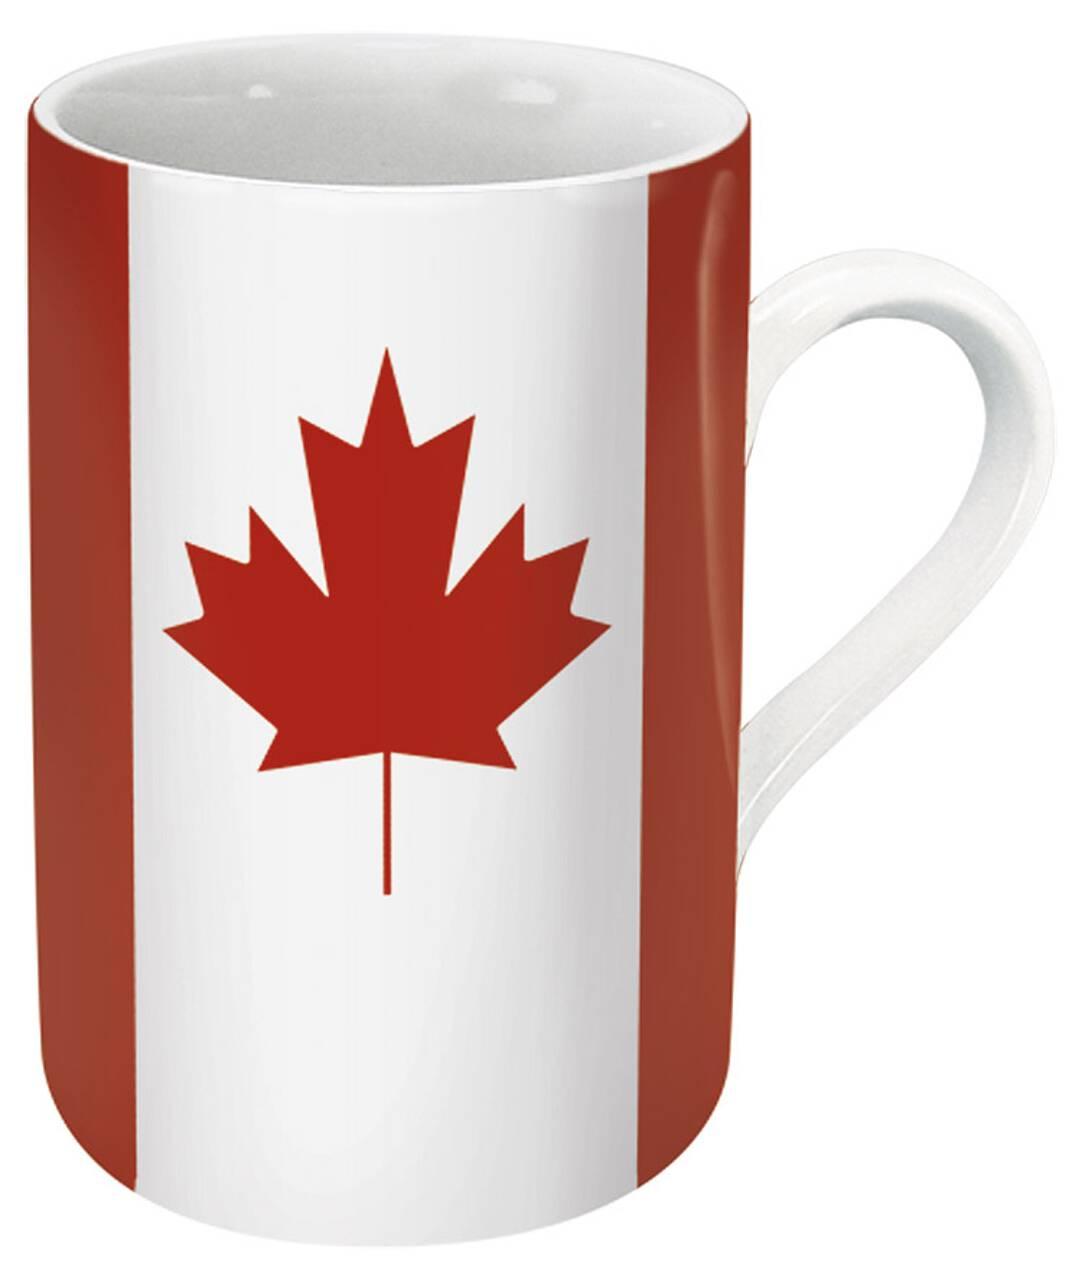 Kaffeebecher mit Motiv Kanadaflagge